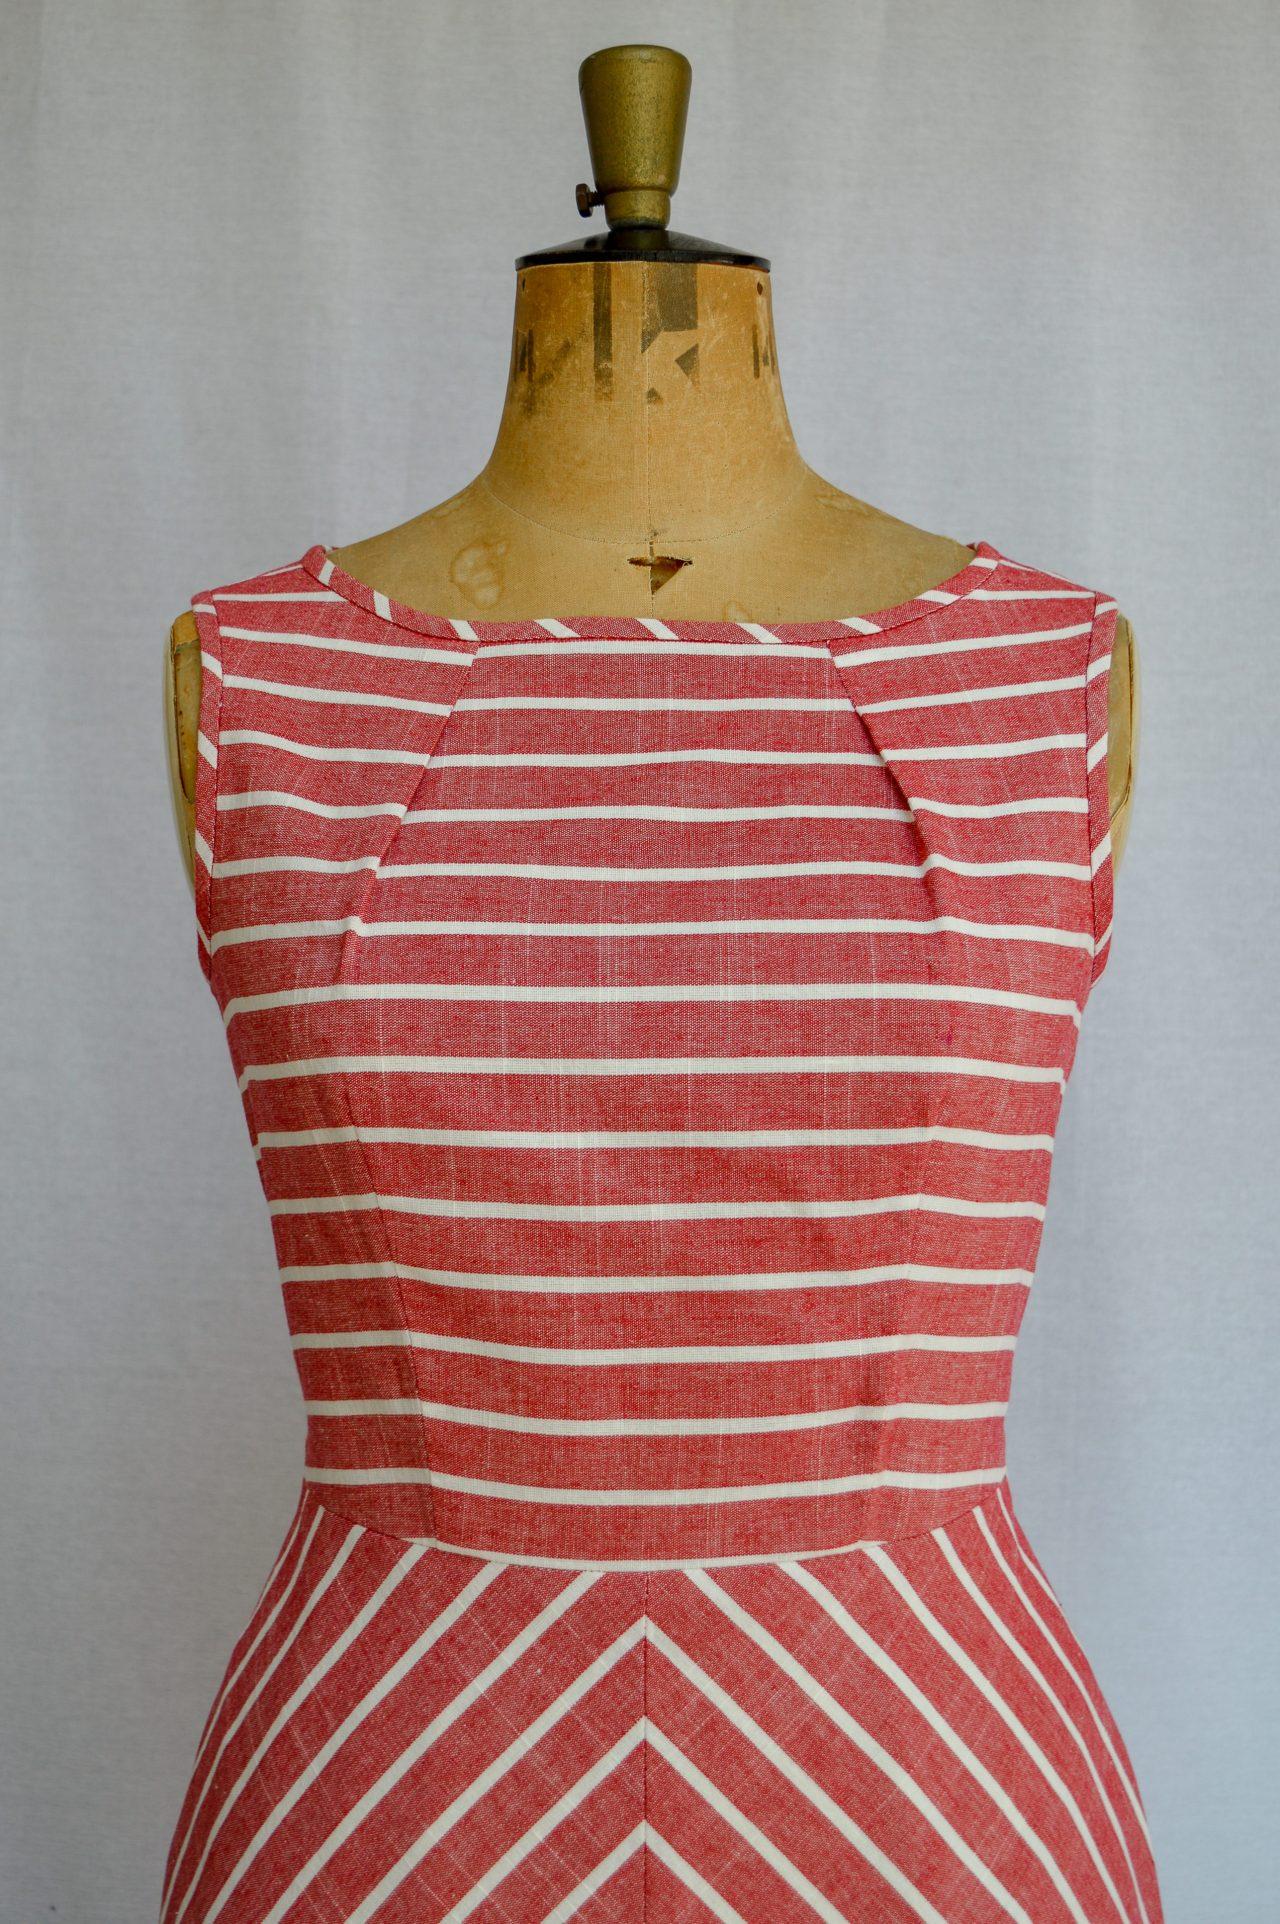 The Barcelona Dress - a Maven pattern